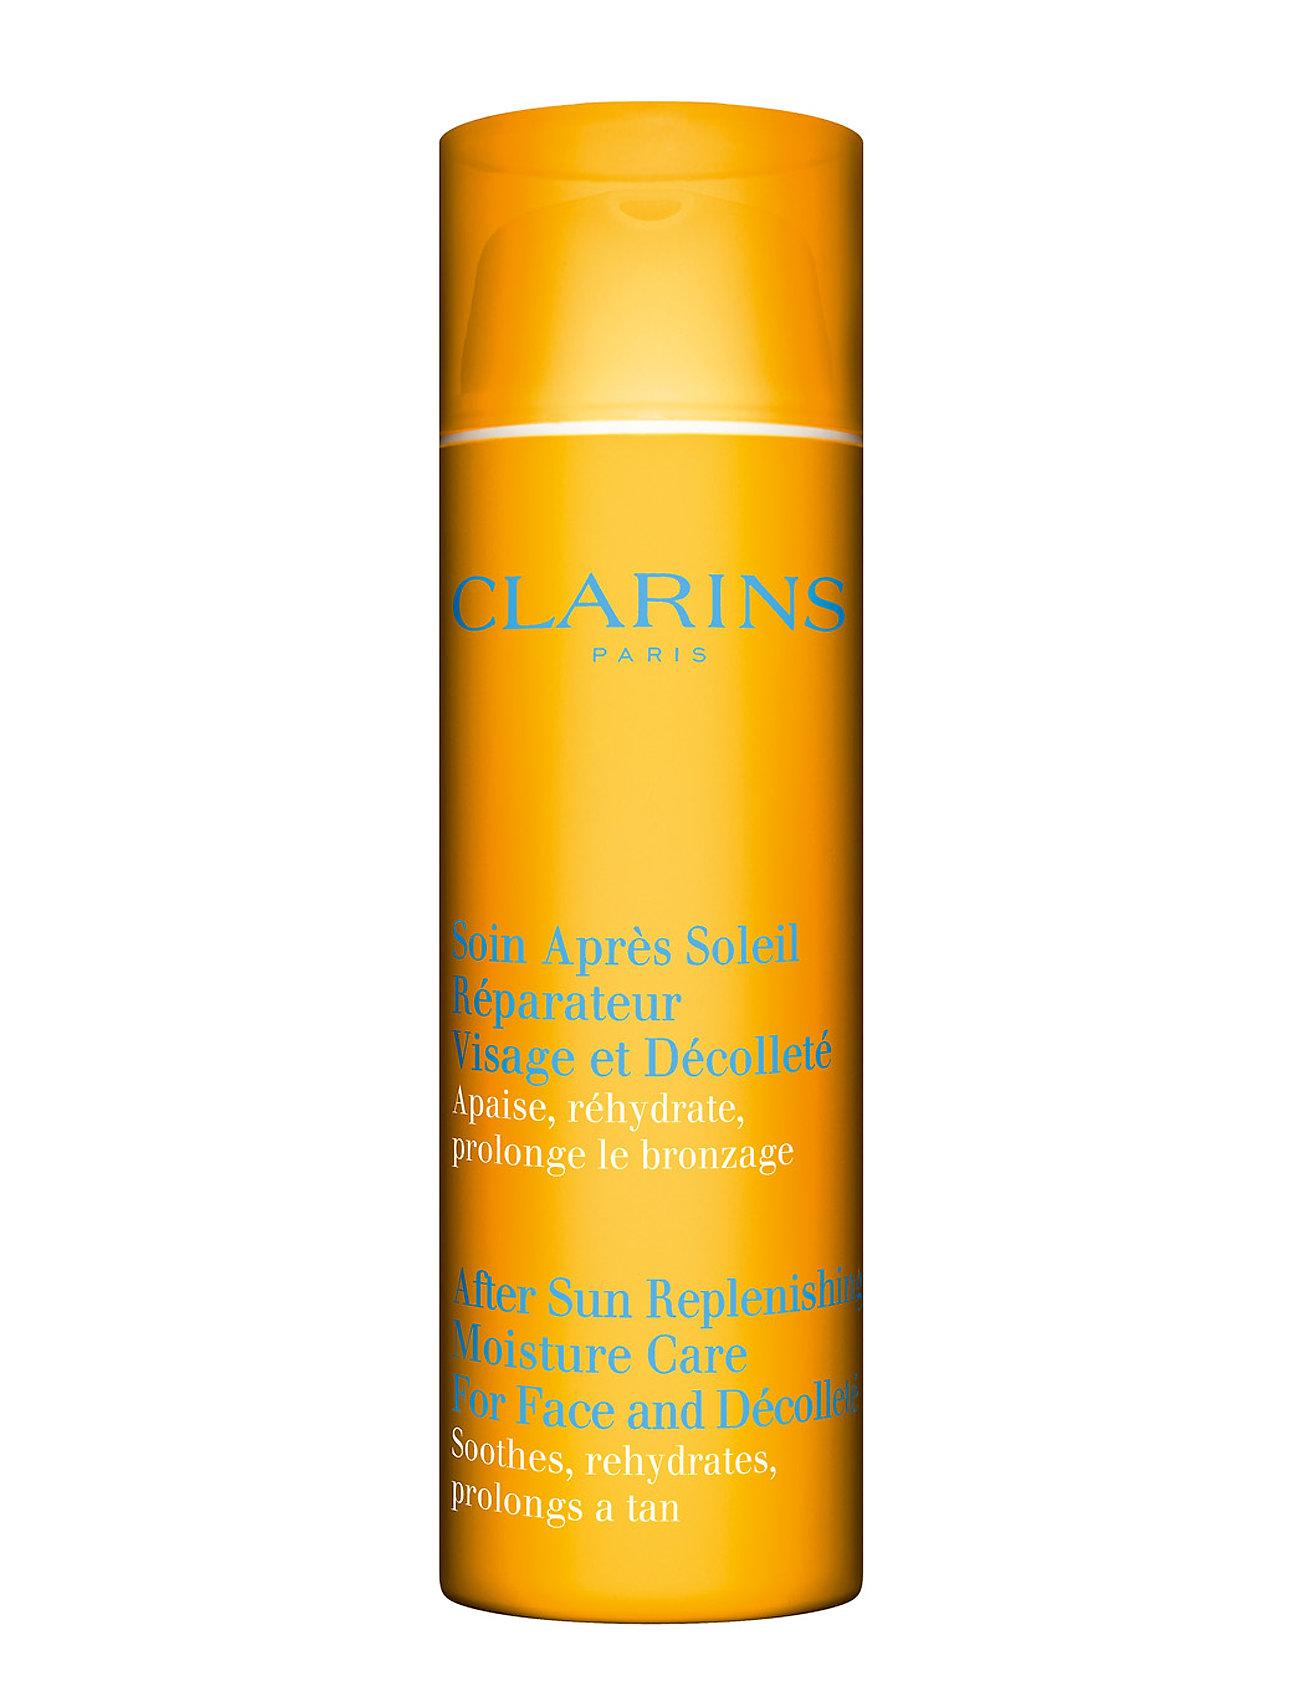 Image of After Sun Face & Decollete Beauty MEN Skin Care Sun Products After Sun Care Nude Clarins (3270895235)